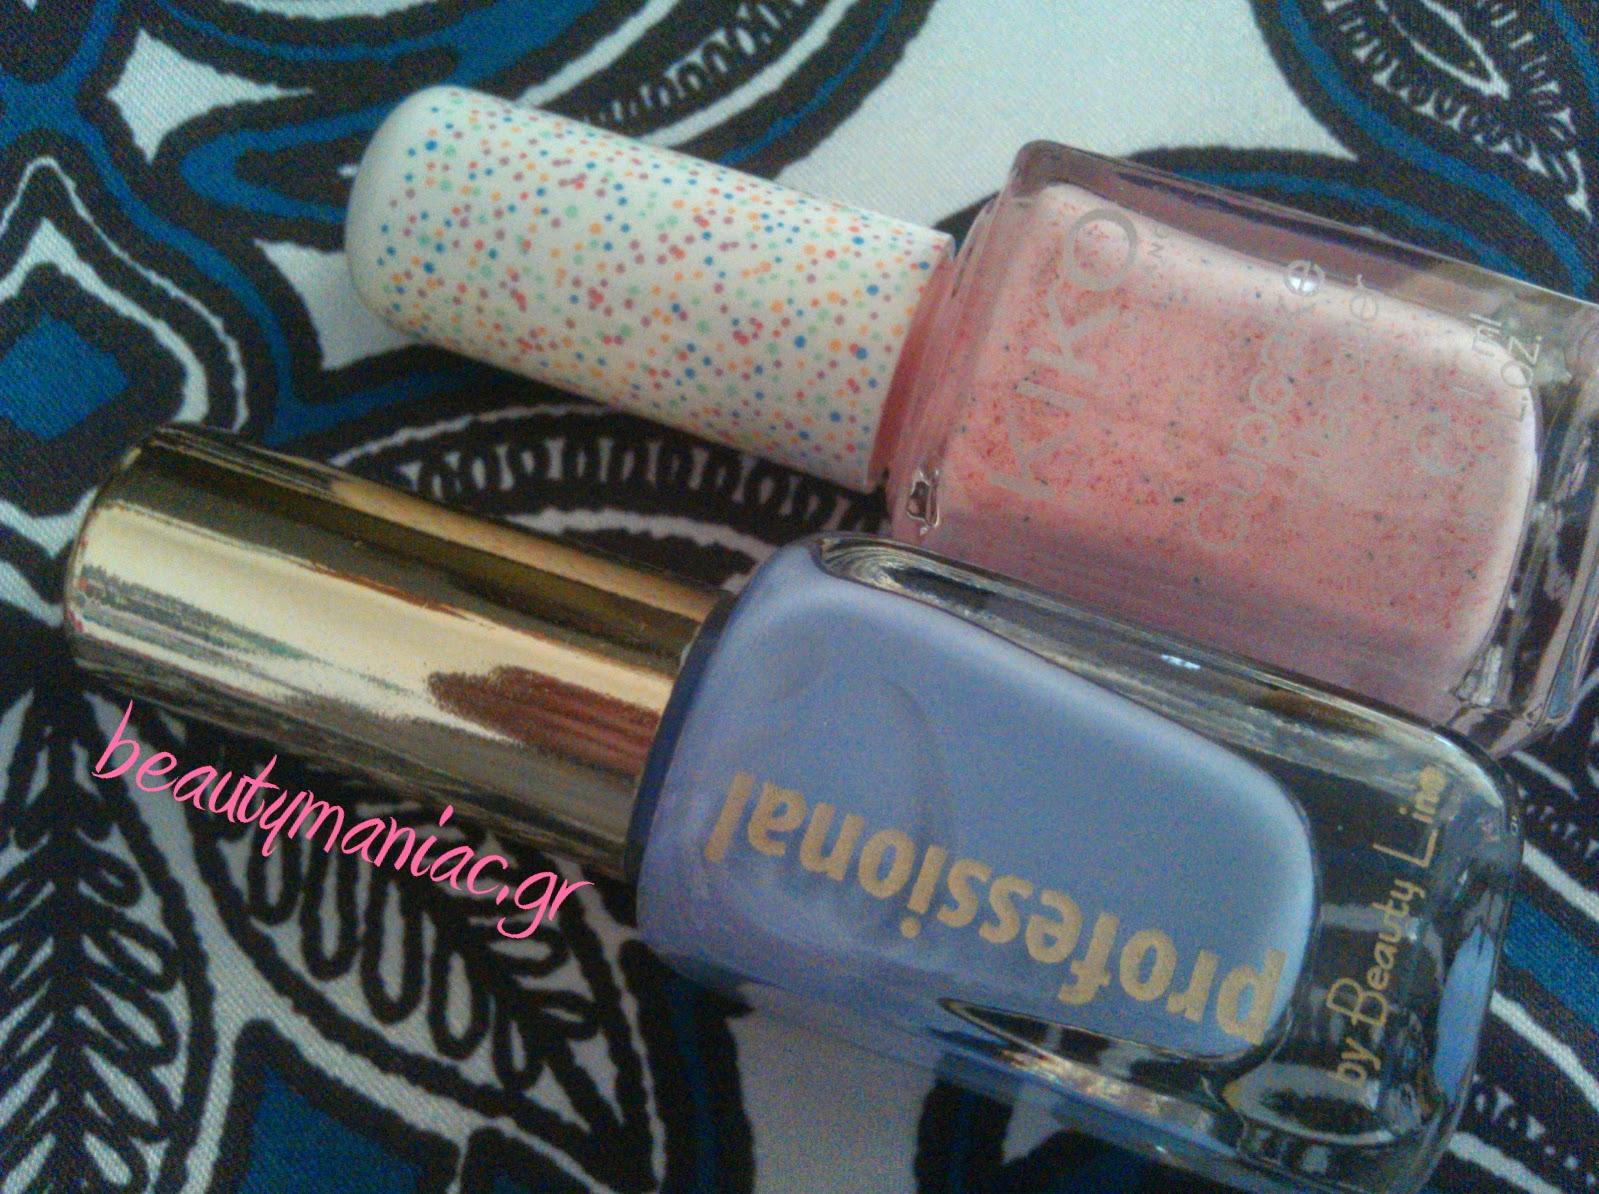 50169bad64c Είναι το KIKO Cupcake #651 Strawberryκαι το λιλά Professional by Beauty  Line που δεν έχει απόχρωση.